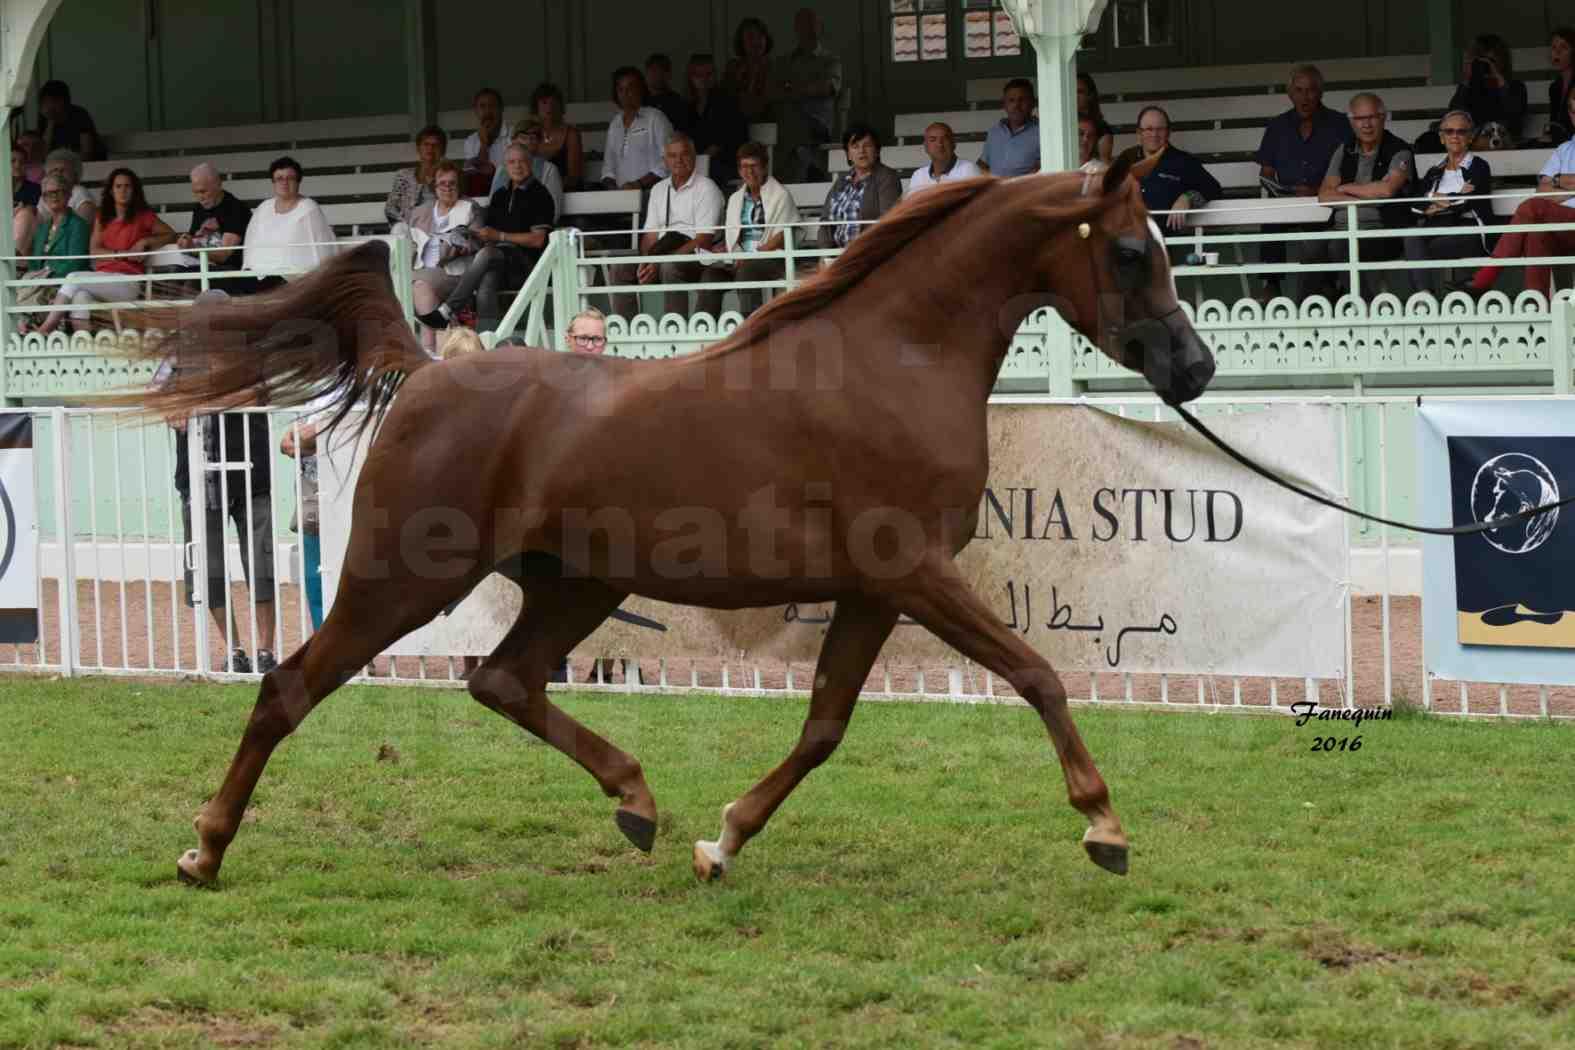 International Arabian Horse Show B de VICHY 2016 - PEARL DE DJOON - Notre Sélection - 03